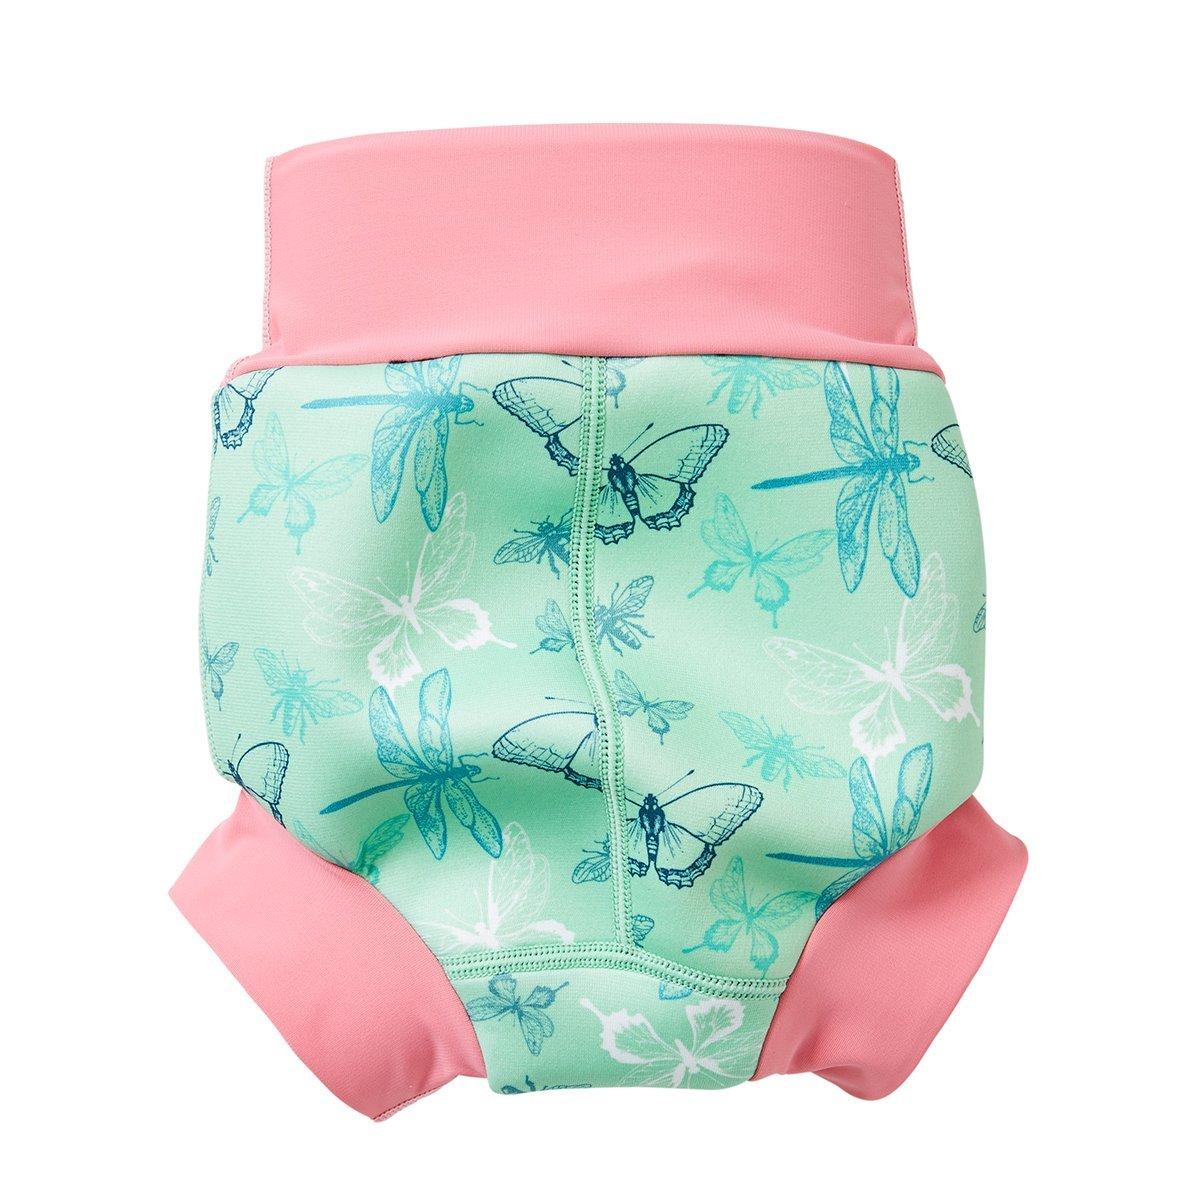 Splash-About-Happy-Nappy-Baby-amp-Toddler-Swimwear-Nappy-and-Shorts-Sun-Safe thumbnail 10